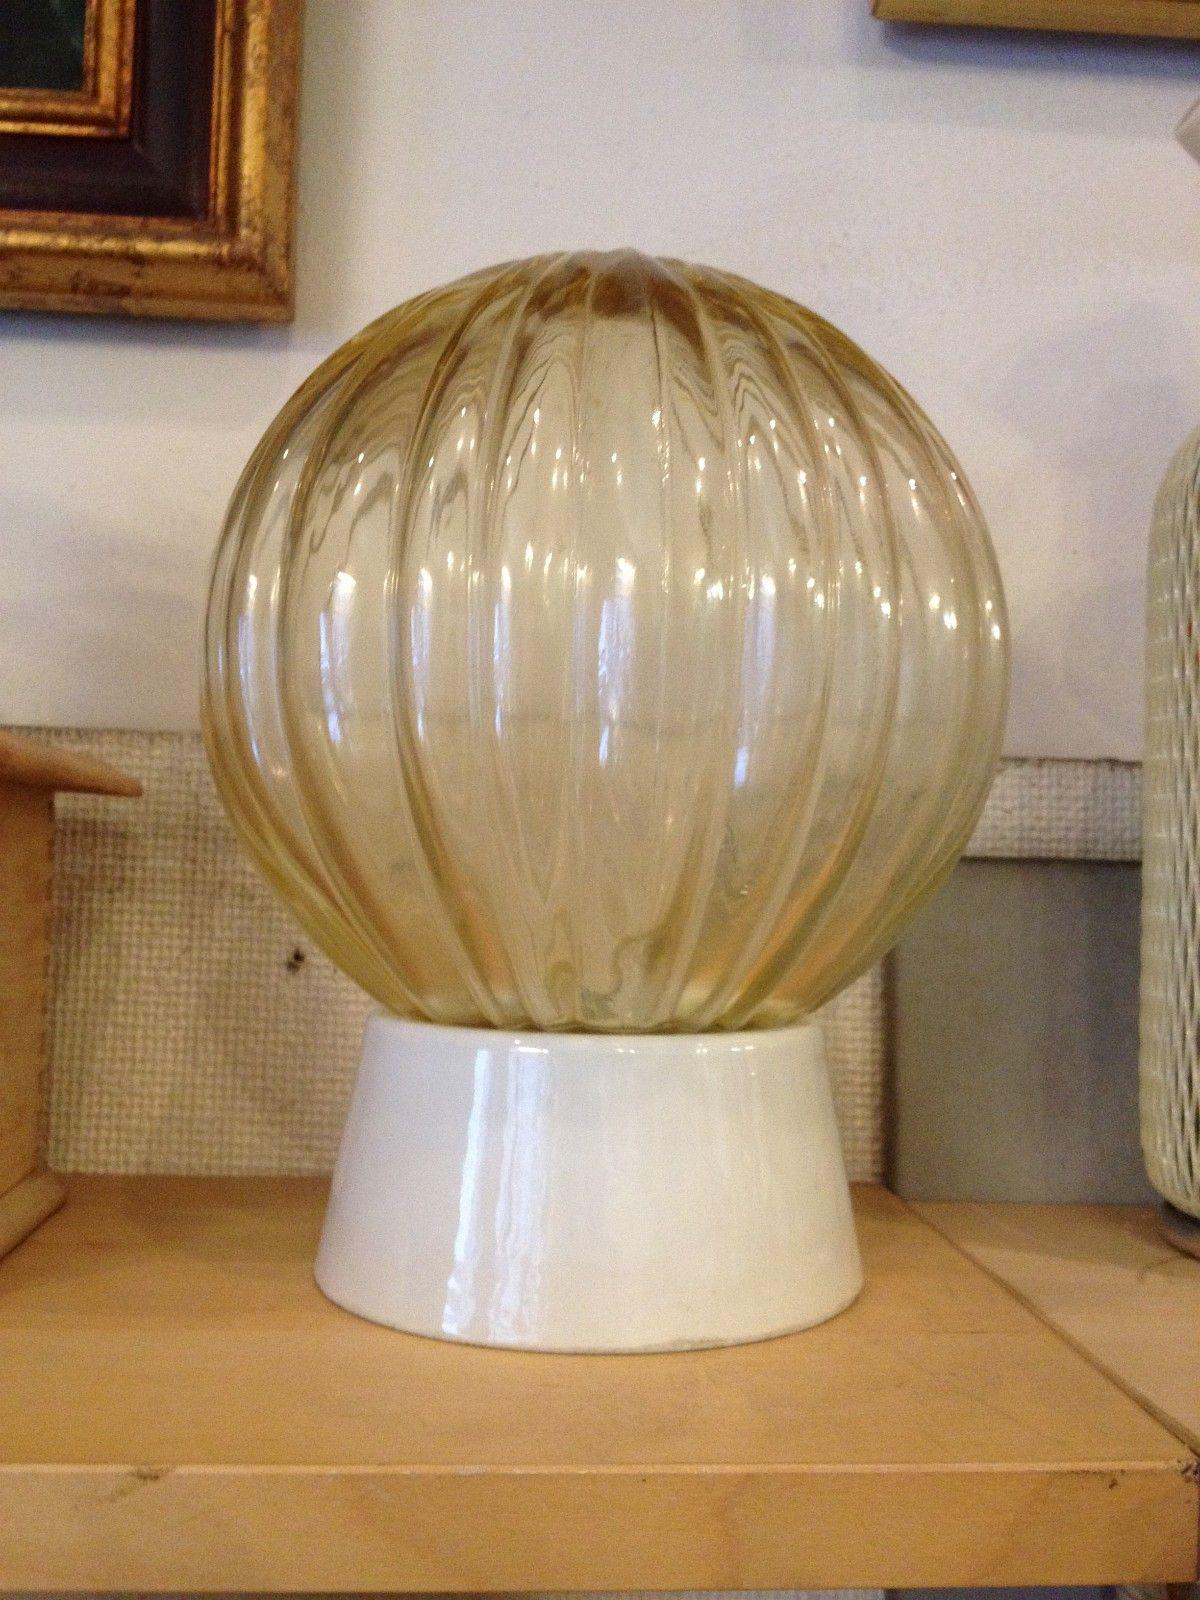 RetroVintage lampe | FINN.no